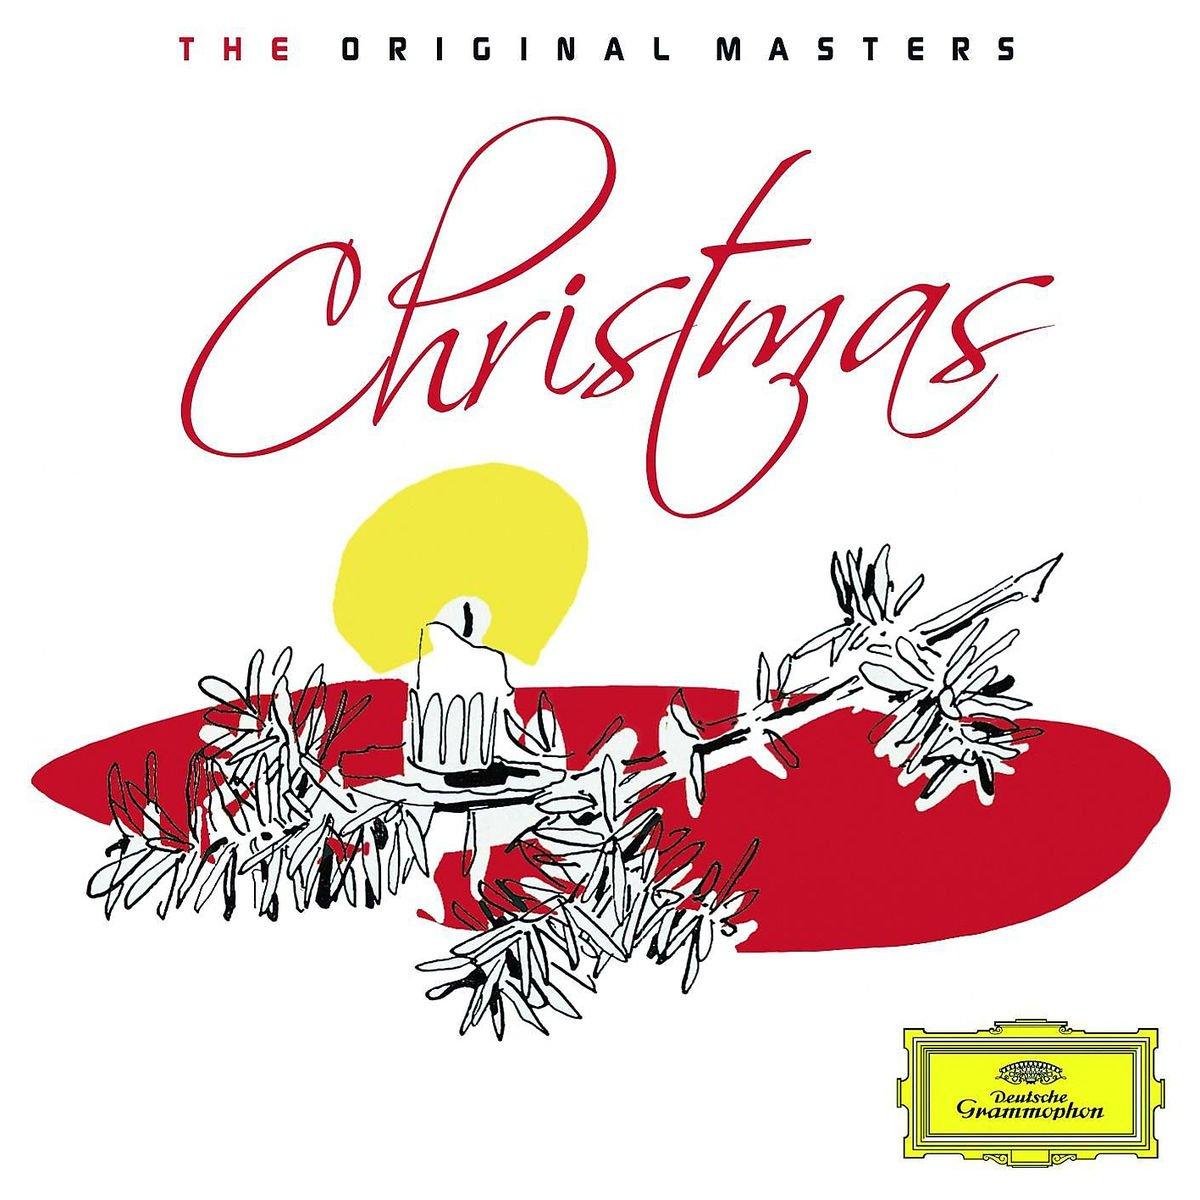 Original Christmas Masters                                                                                                                                                                                                                                                                                                                                                                                                <span class=